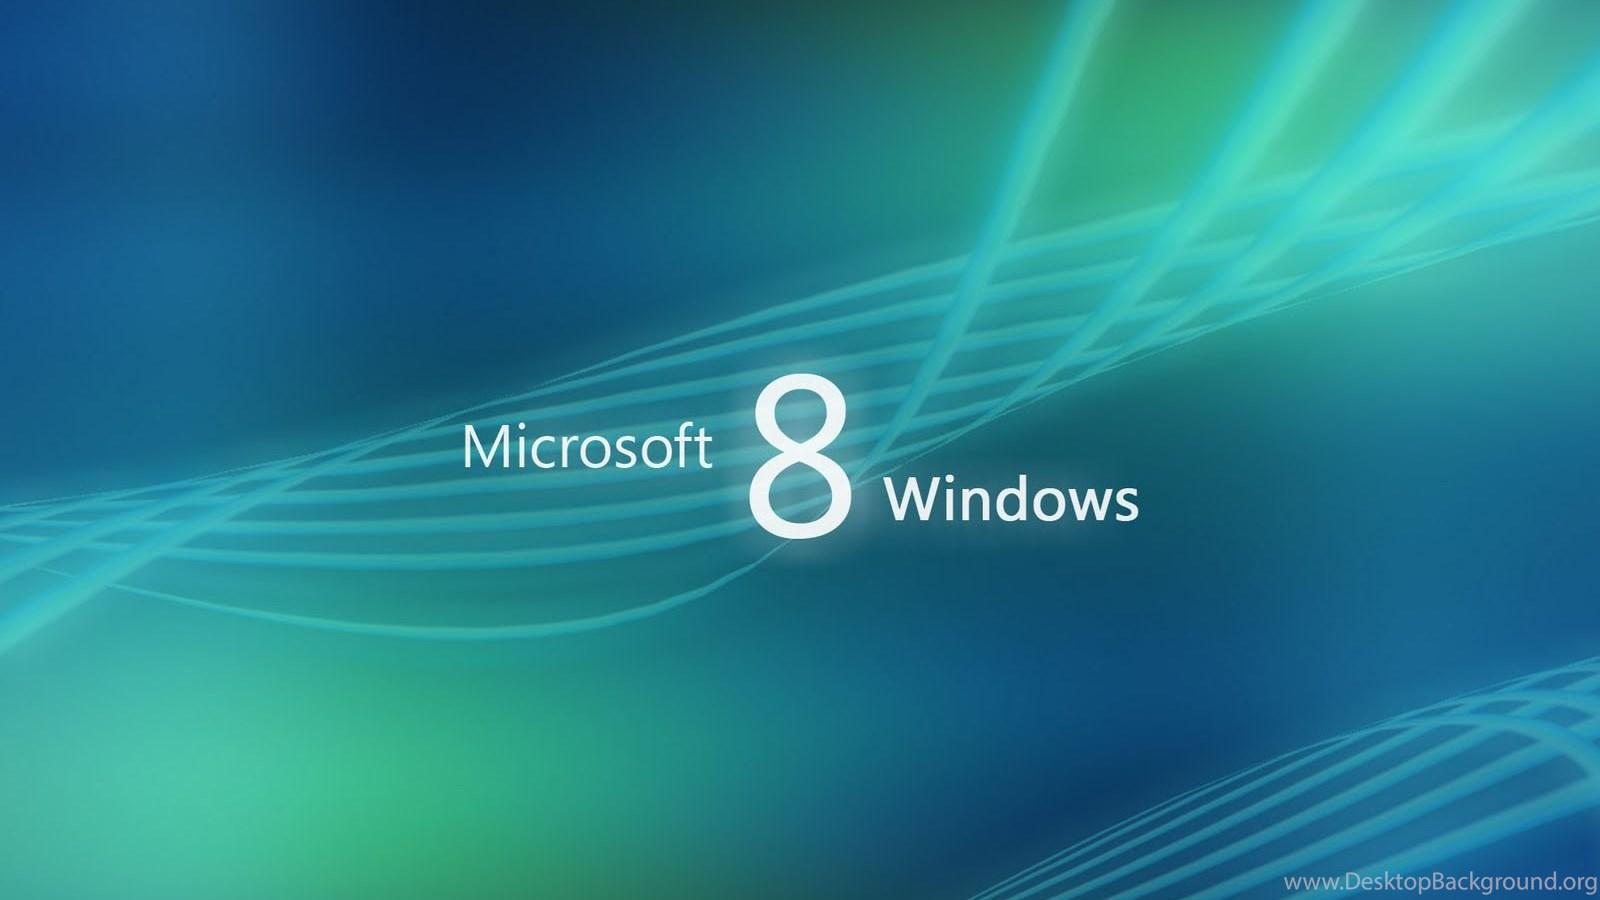 windows 8 backgrounds themes atoz desktop wallpapers desktop